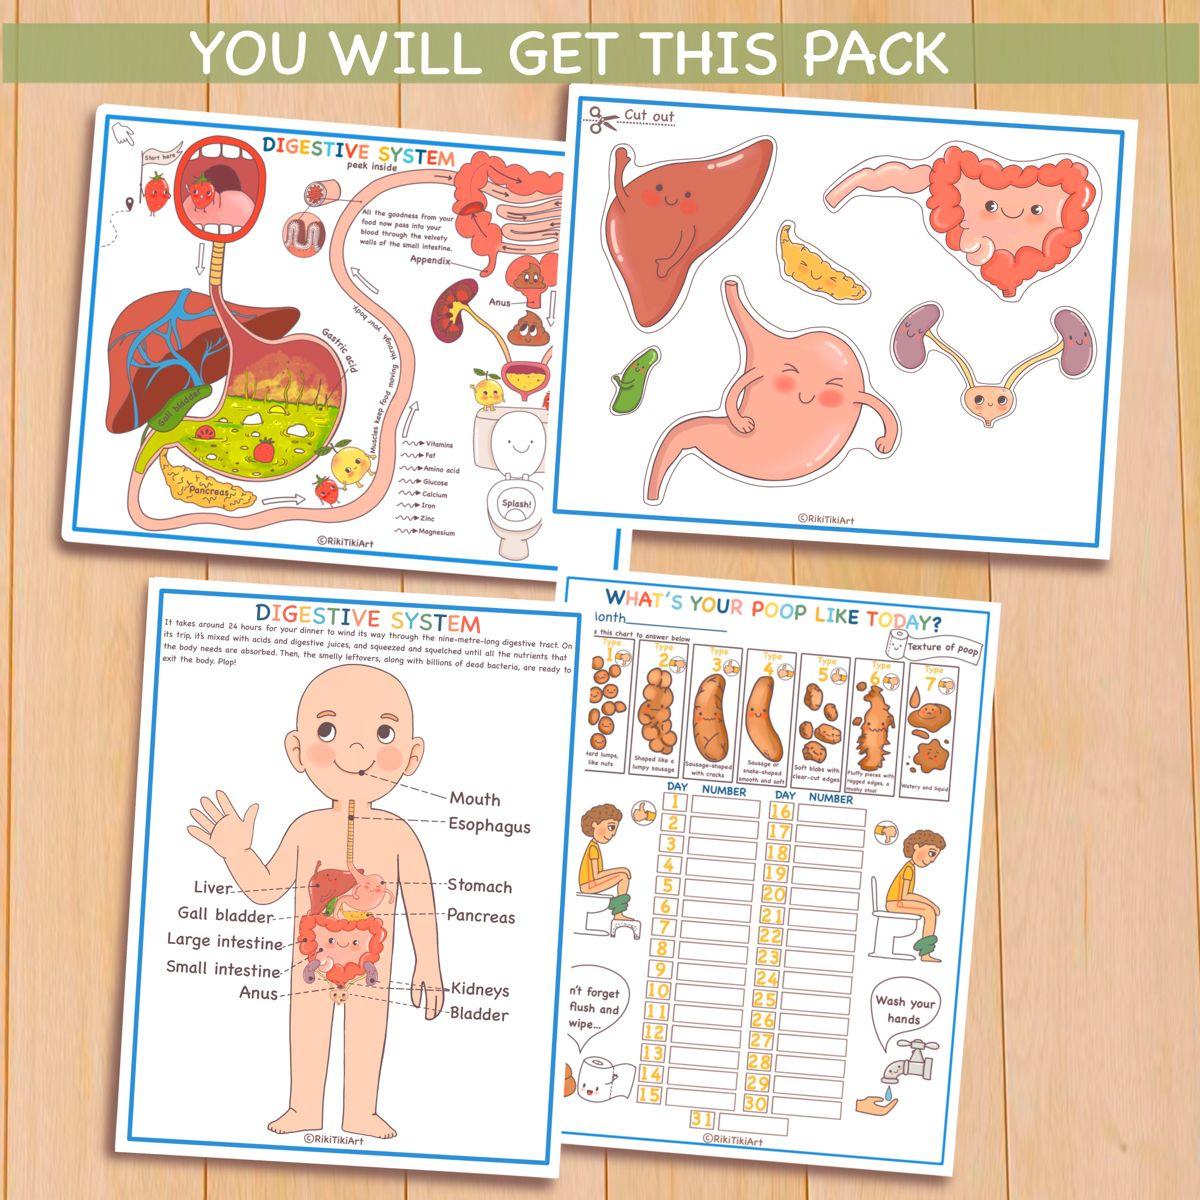 Human Digestive System Anatomy Bundle About Me Homeschool Curriculum Preschool Printable Toddler Activities Kids Calendar Homeschooling Materials Homeschool Learning [ 1200 x 1200 Pixel ]